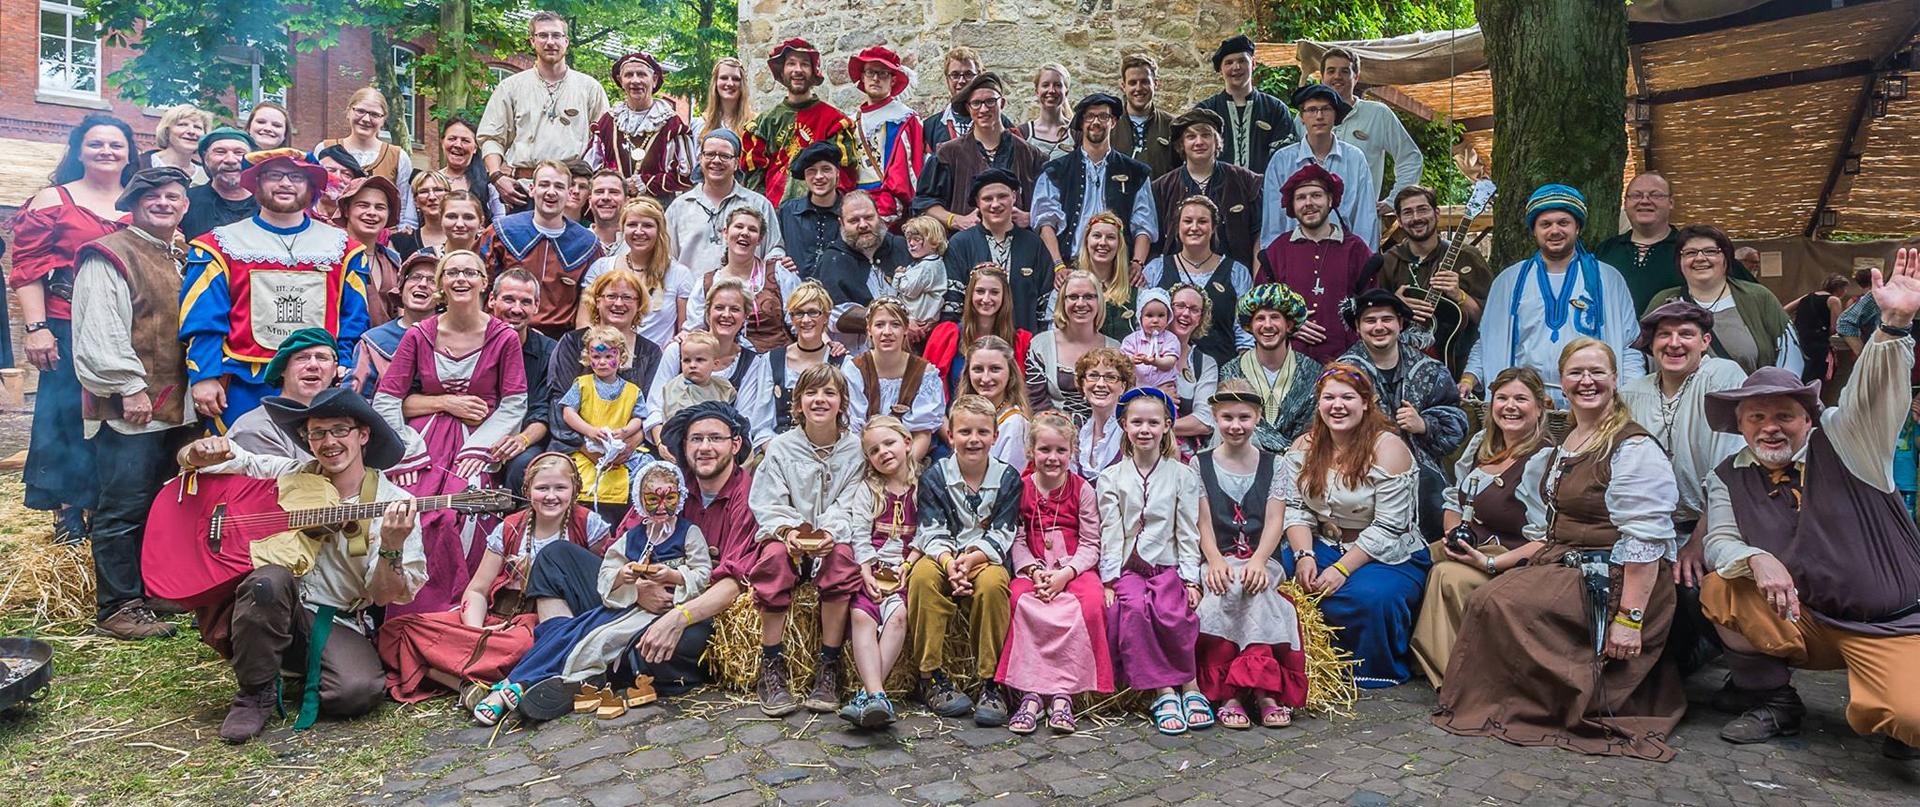 Sektionsfoto Kivelingsfest 2014